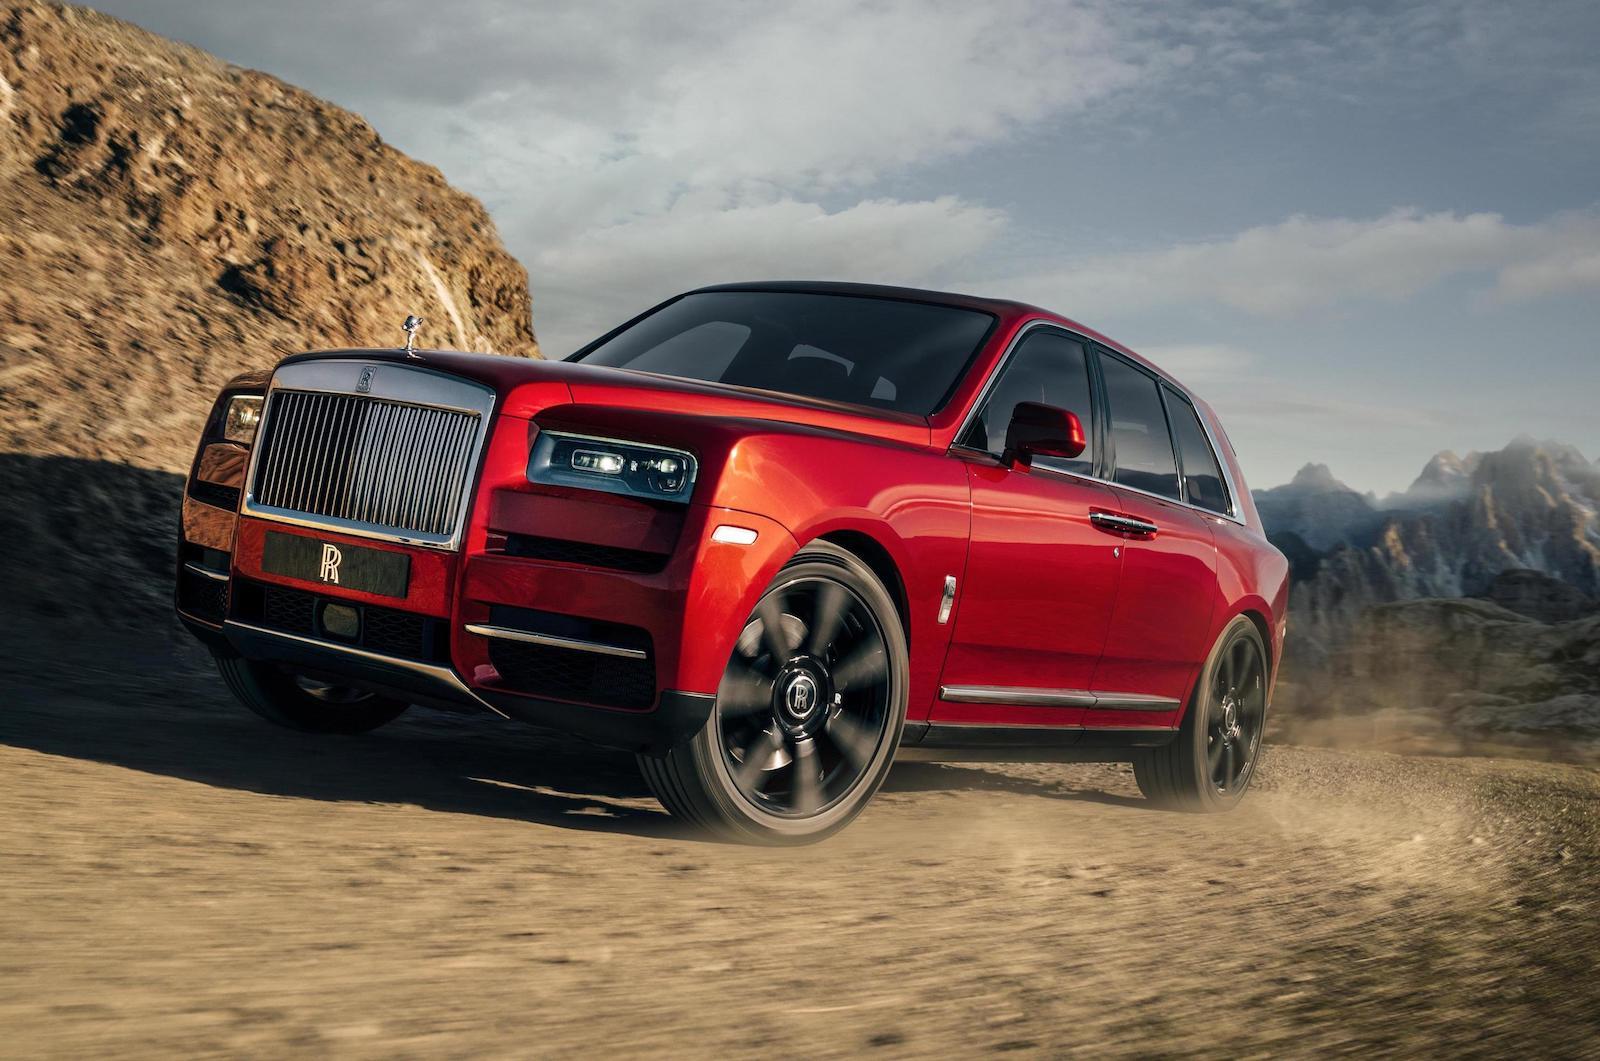 Ford Suv Models >> Rolls-Royce Cullinan SUV unveiled | PerformanceDrive